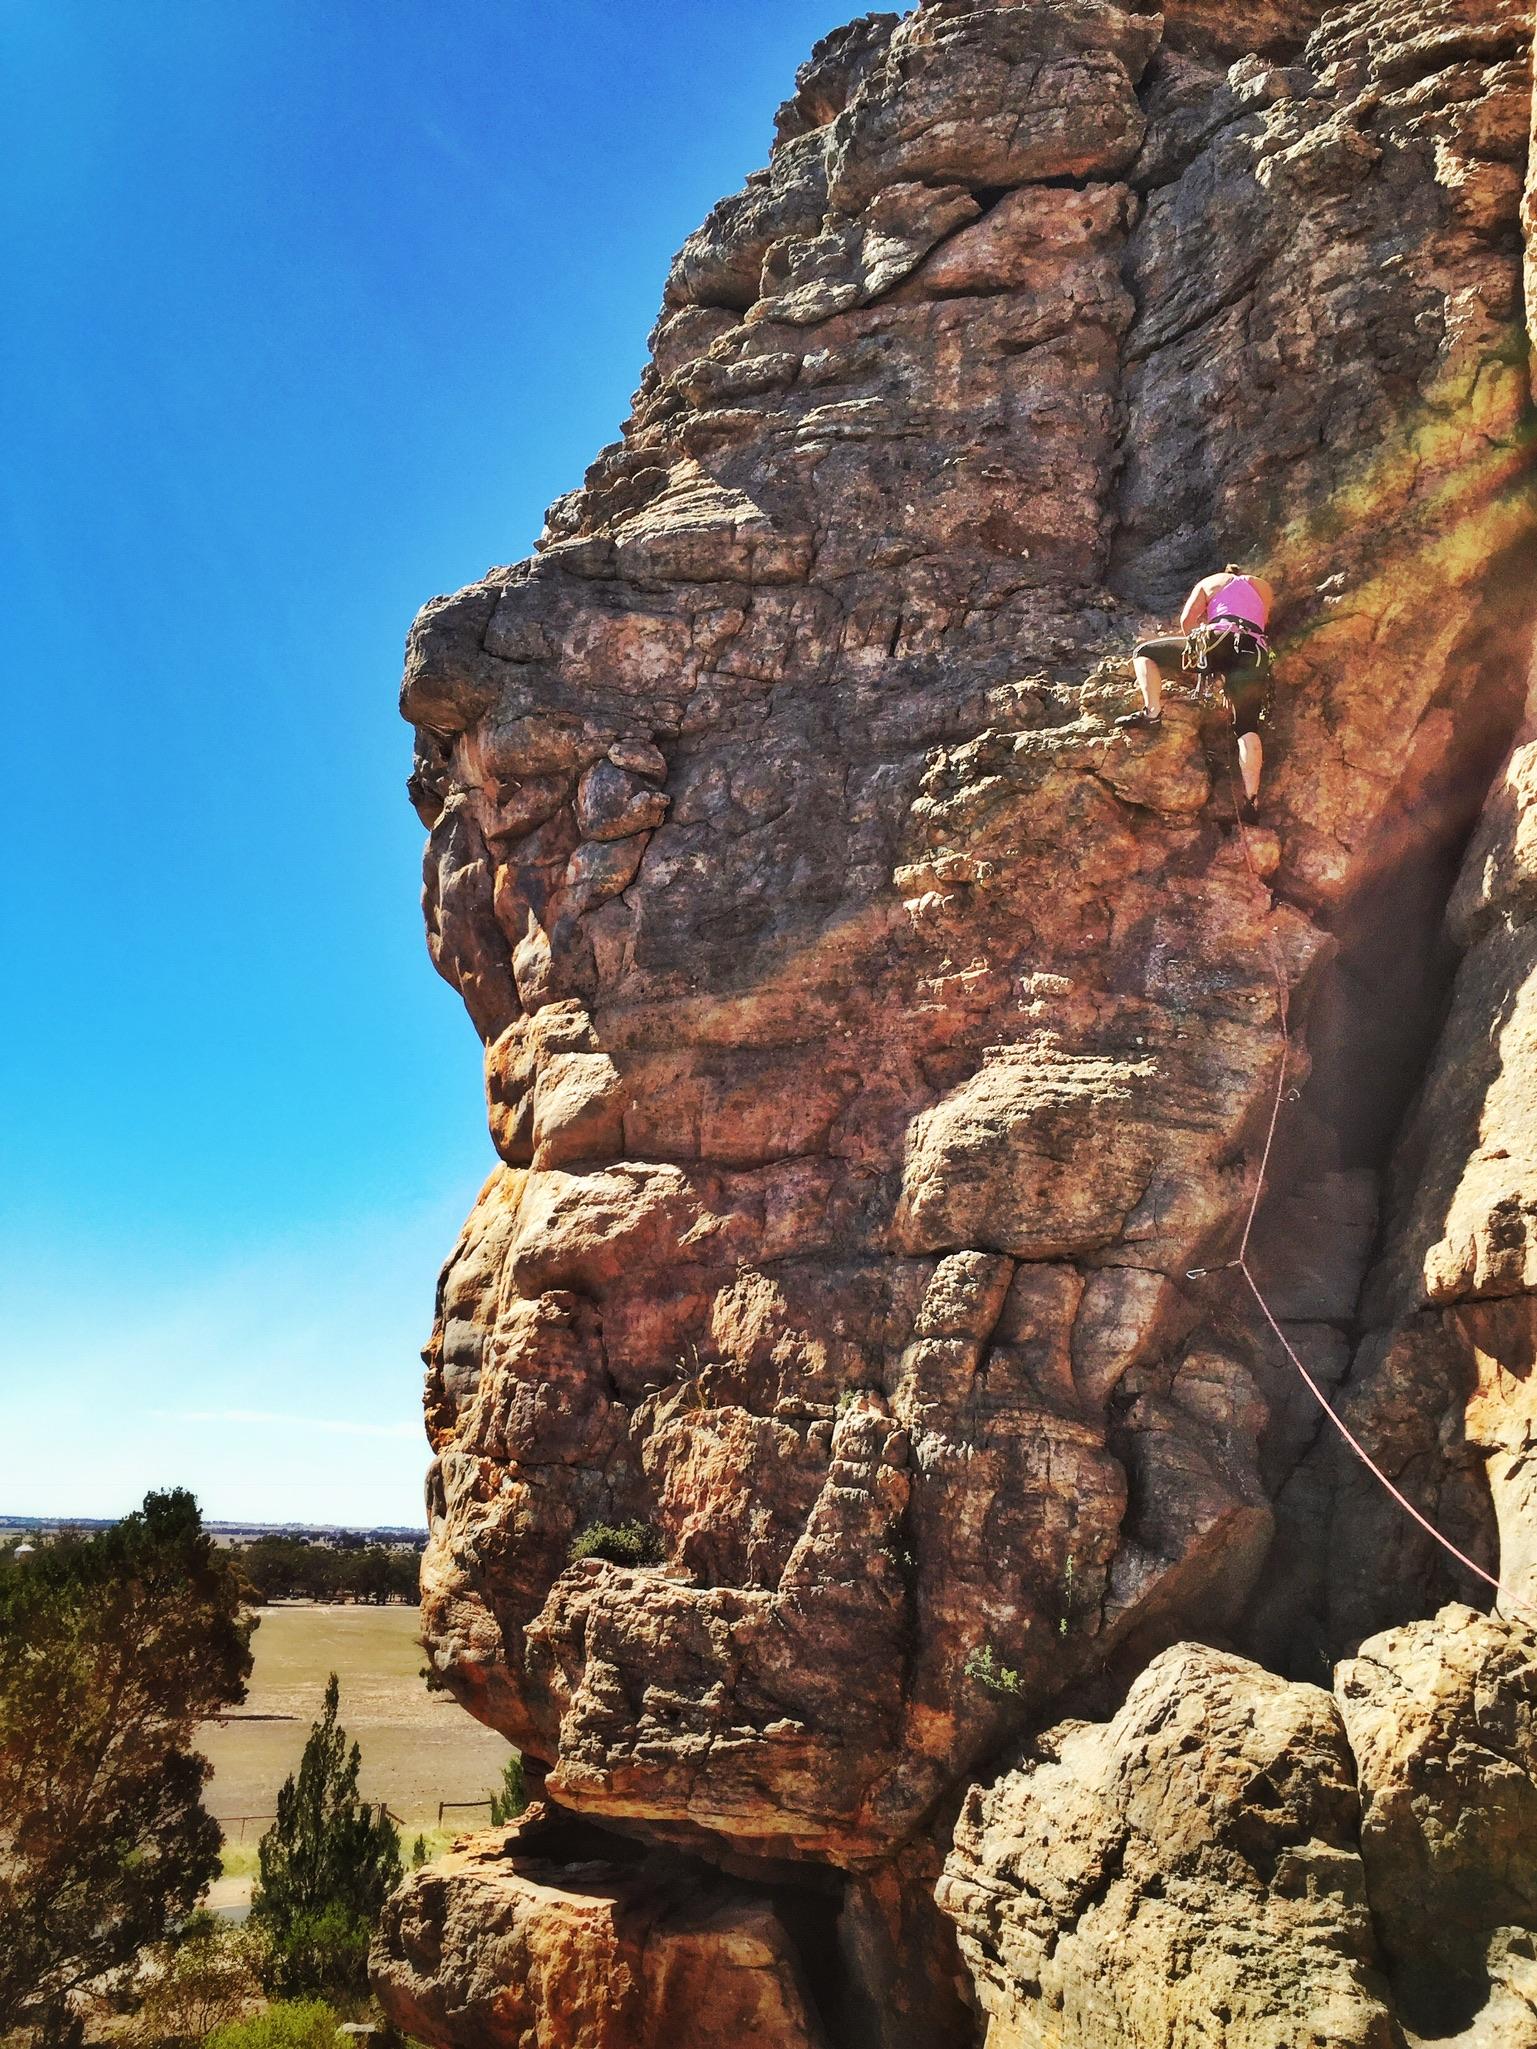 Lead climbing at Mount Arapiles, Australia